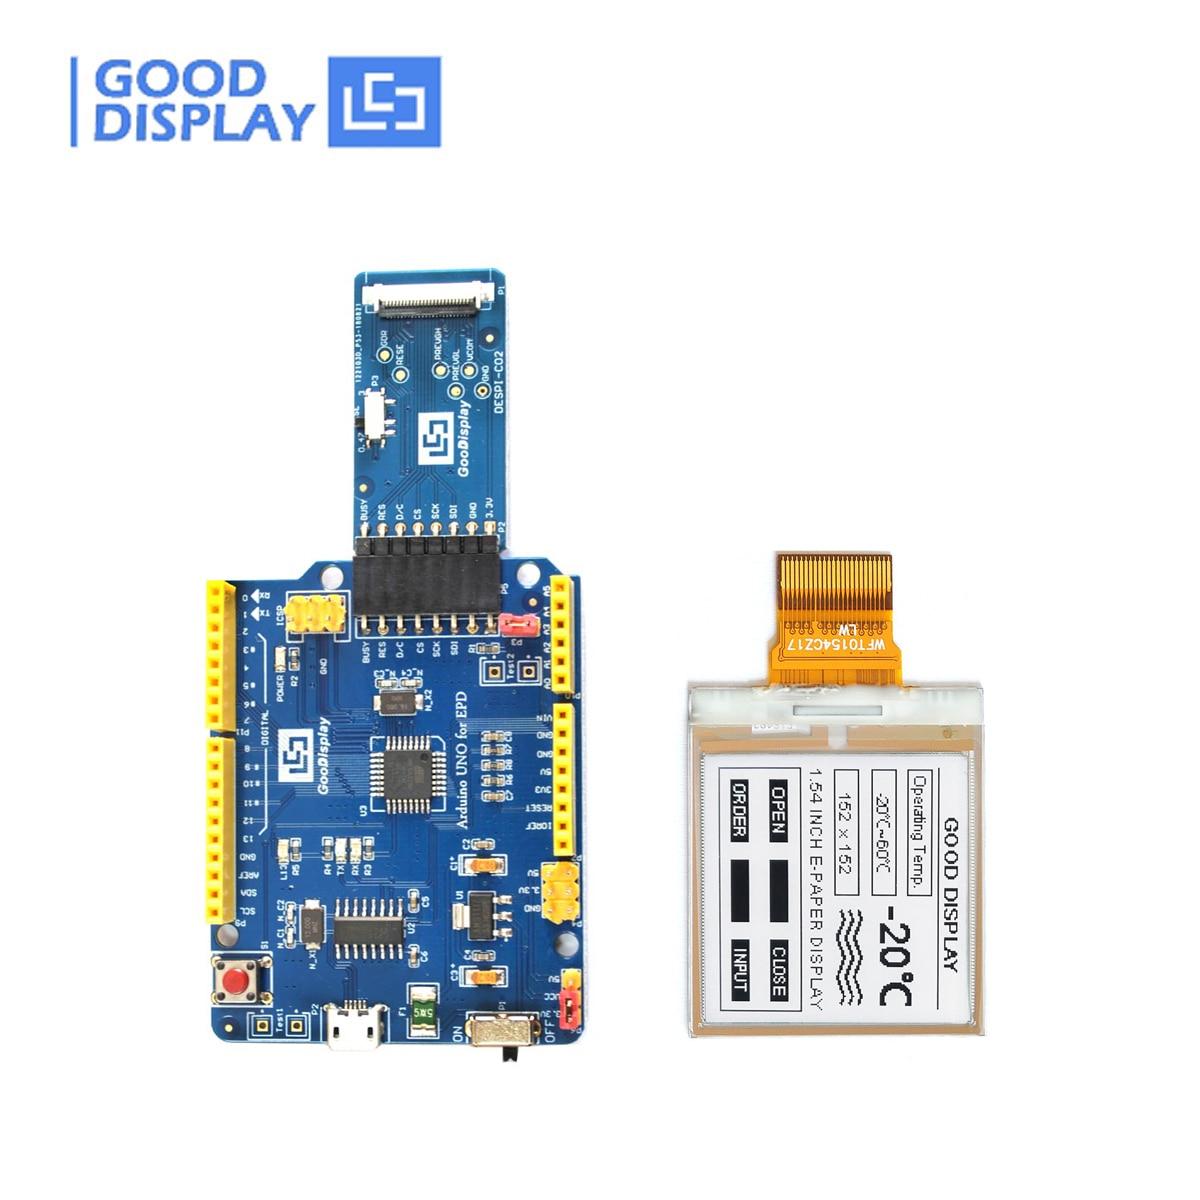 panel-de-tinta-electronica-pequeno-de-154-pulgadas-con-plataforma-arduino-tablero-de-conduccion